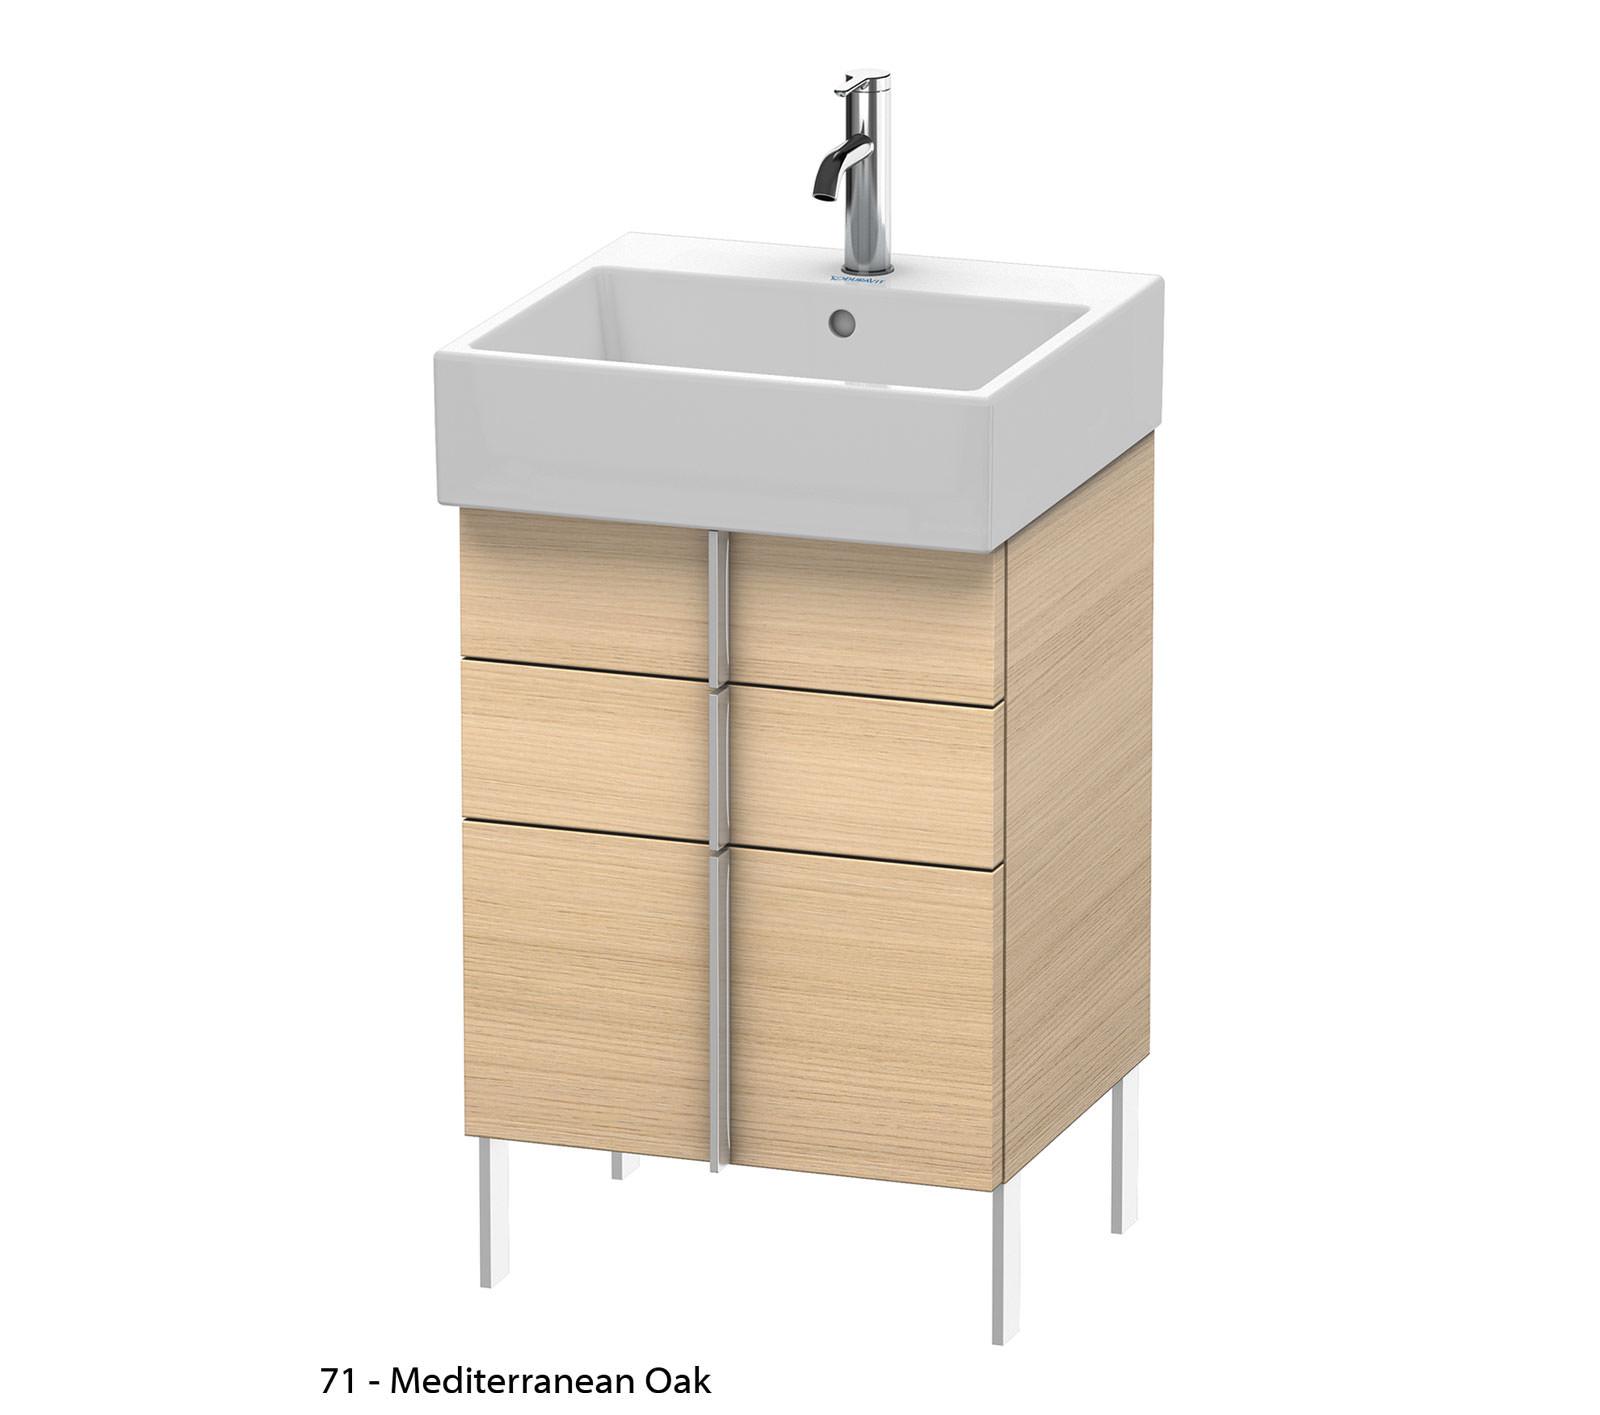 duravit vero air 484 x 431mm 2 drawer floor standing unit. Black Bedroom Furniture Sets. Home Design Ideas